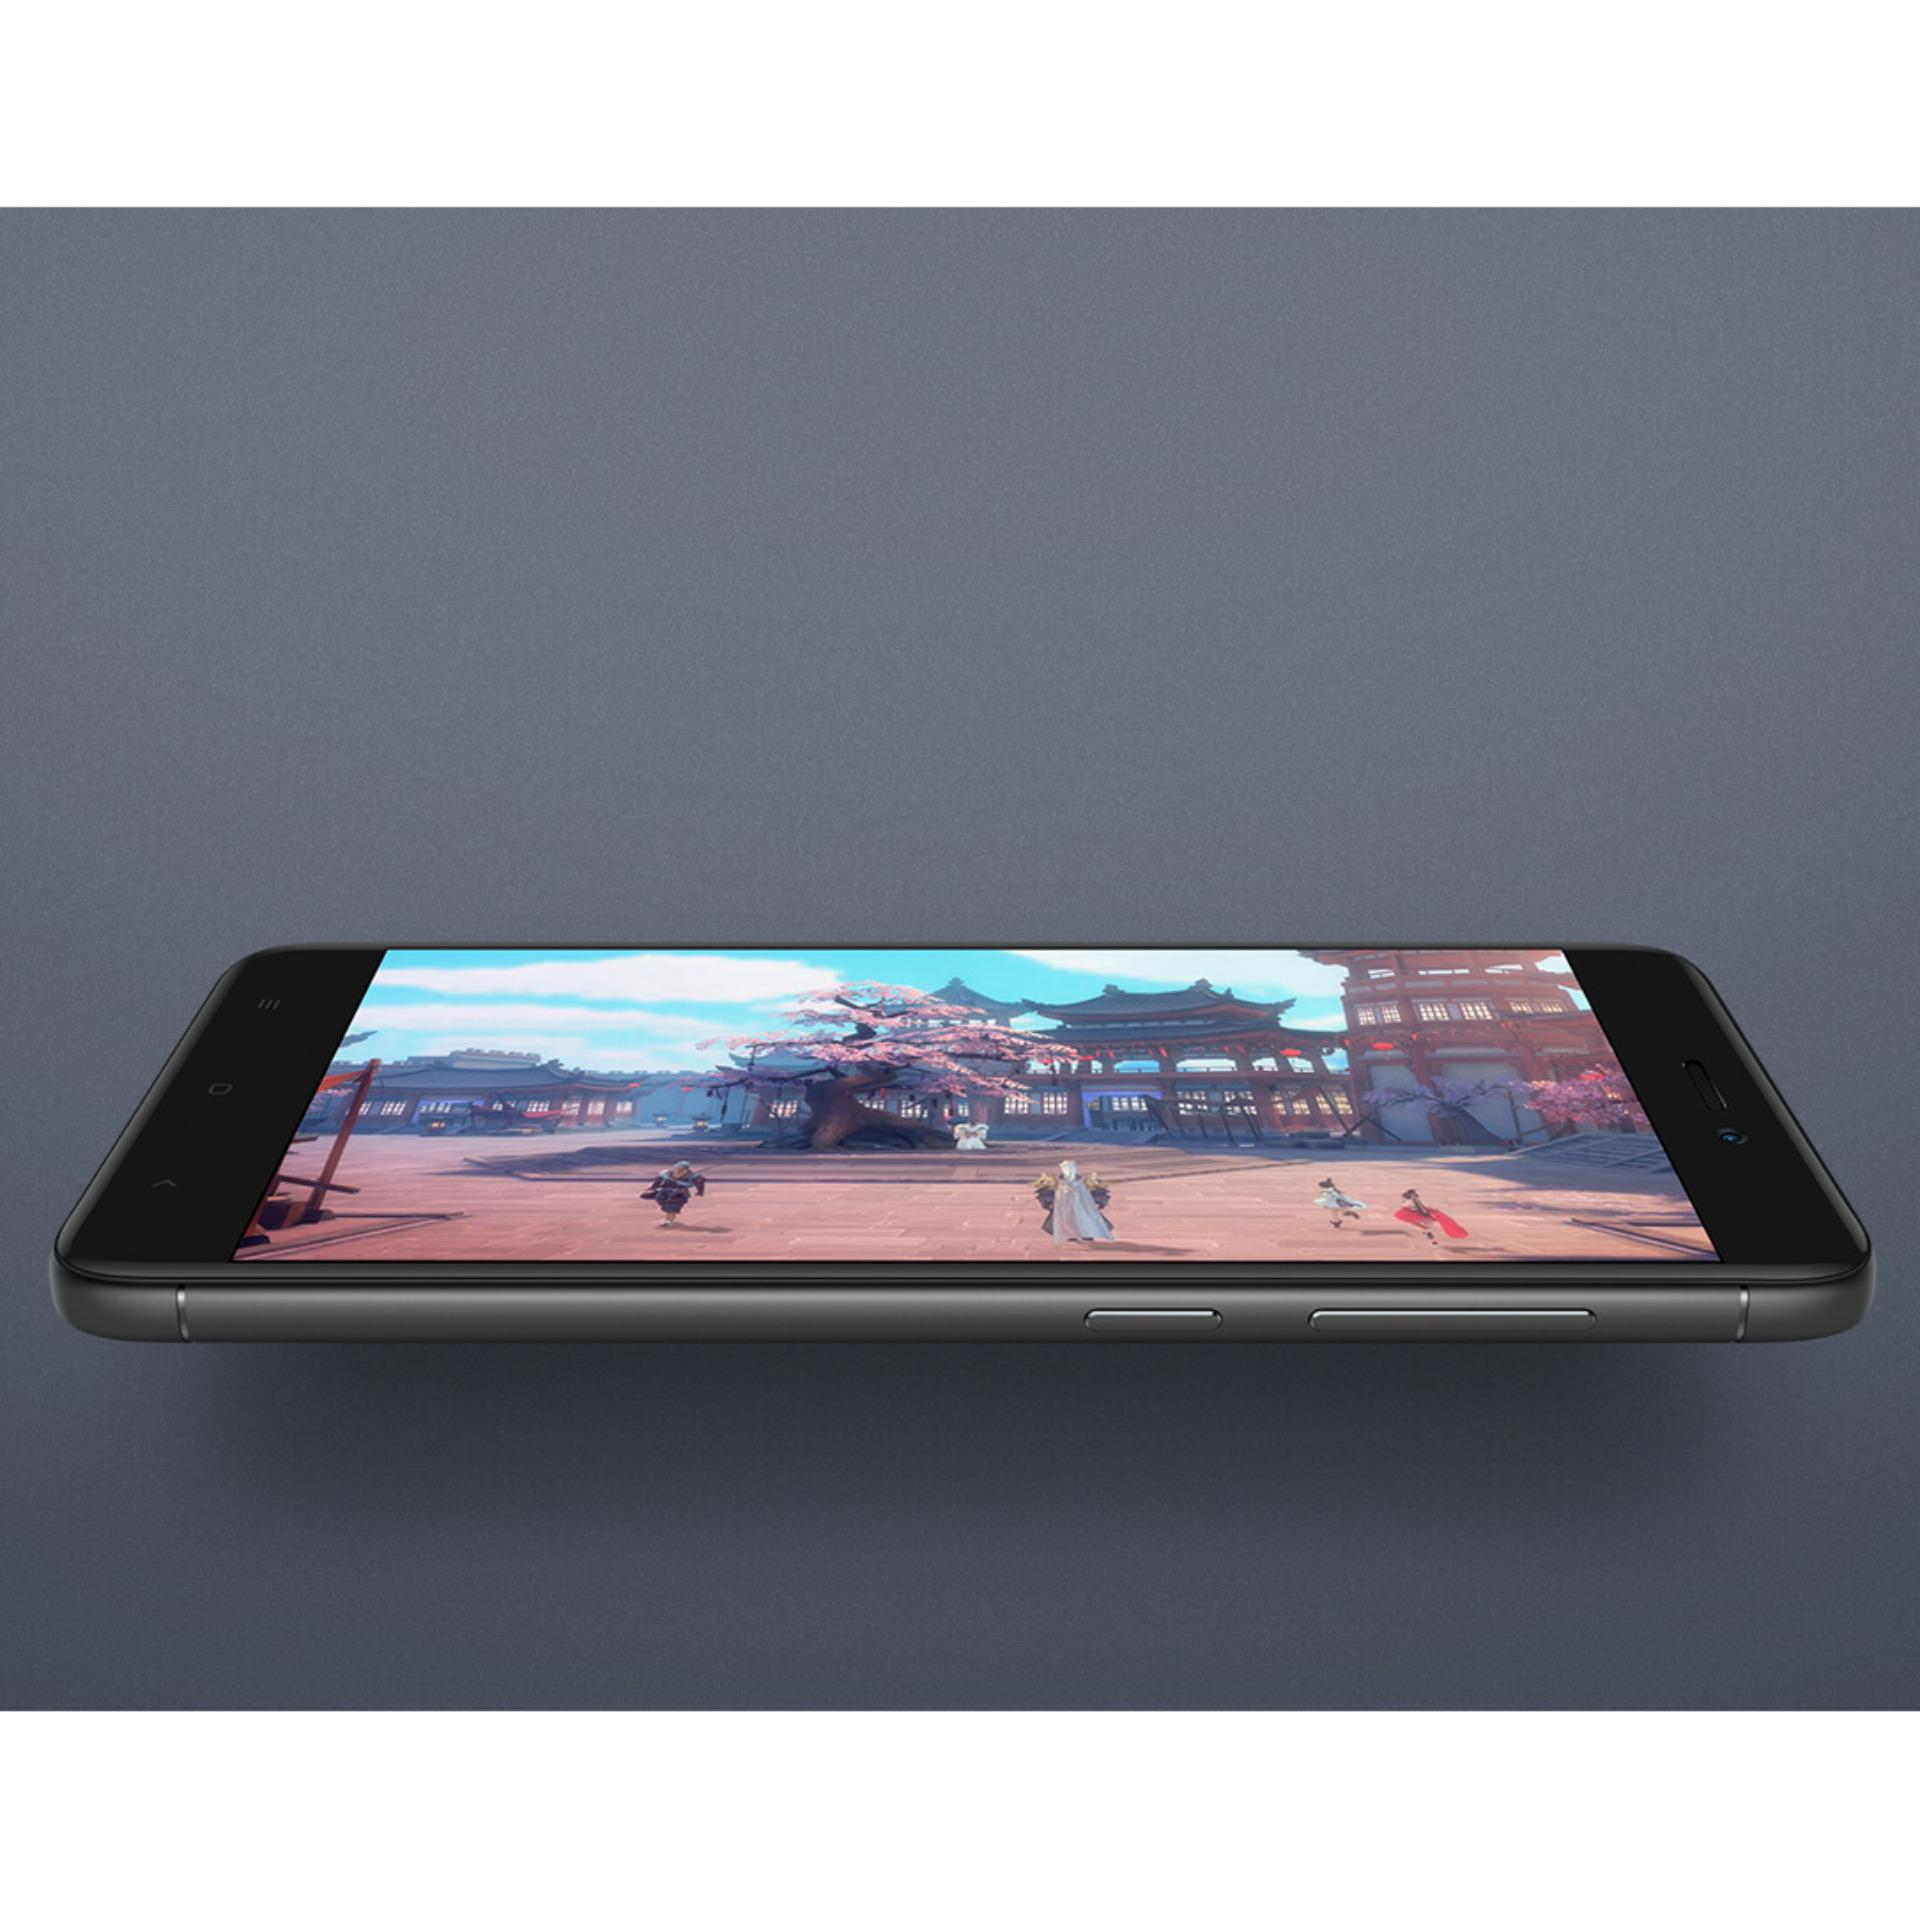 Anggaran Terbaik Xiaomi Redmi 4x 3 32gb Black Hitam Fingerprint 4a Internal 2 32 Gb Garansi Resmi Tam Snapdragon 435 4100mah